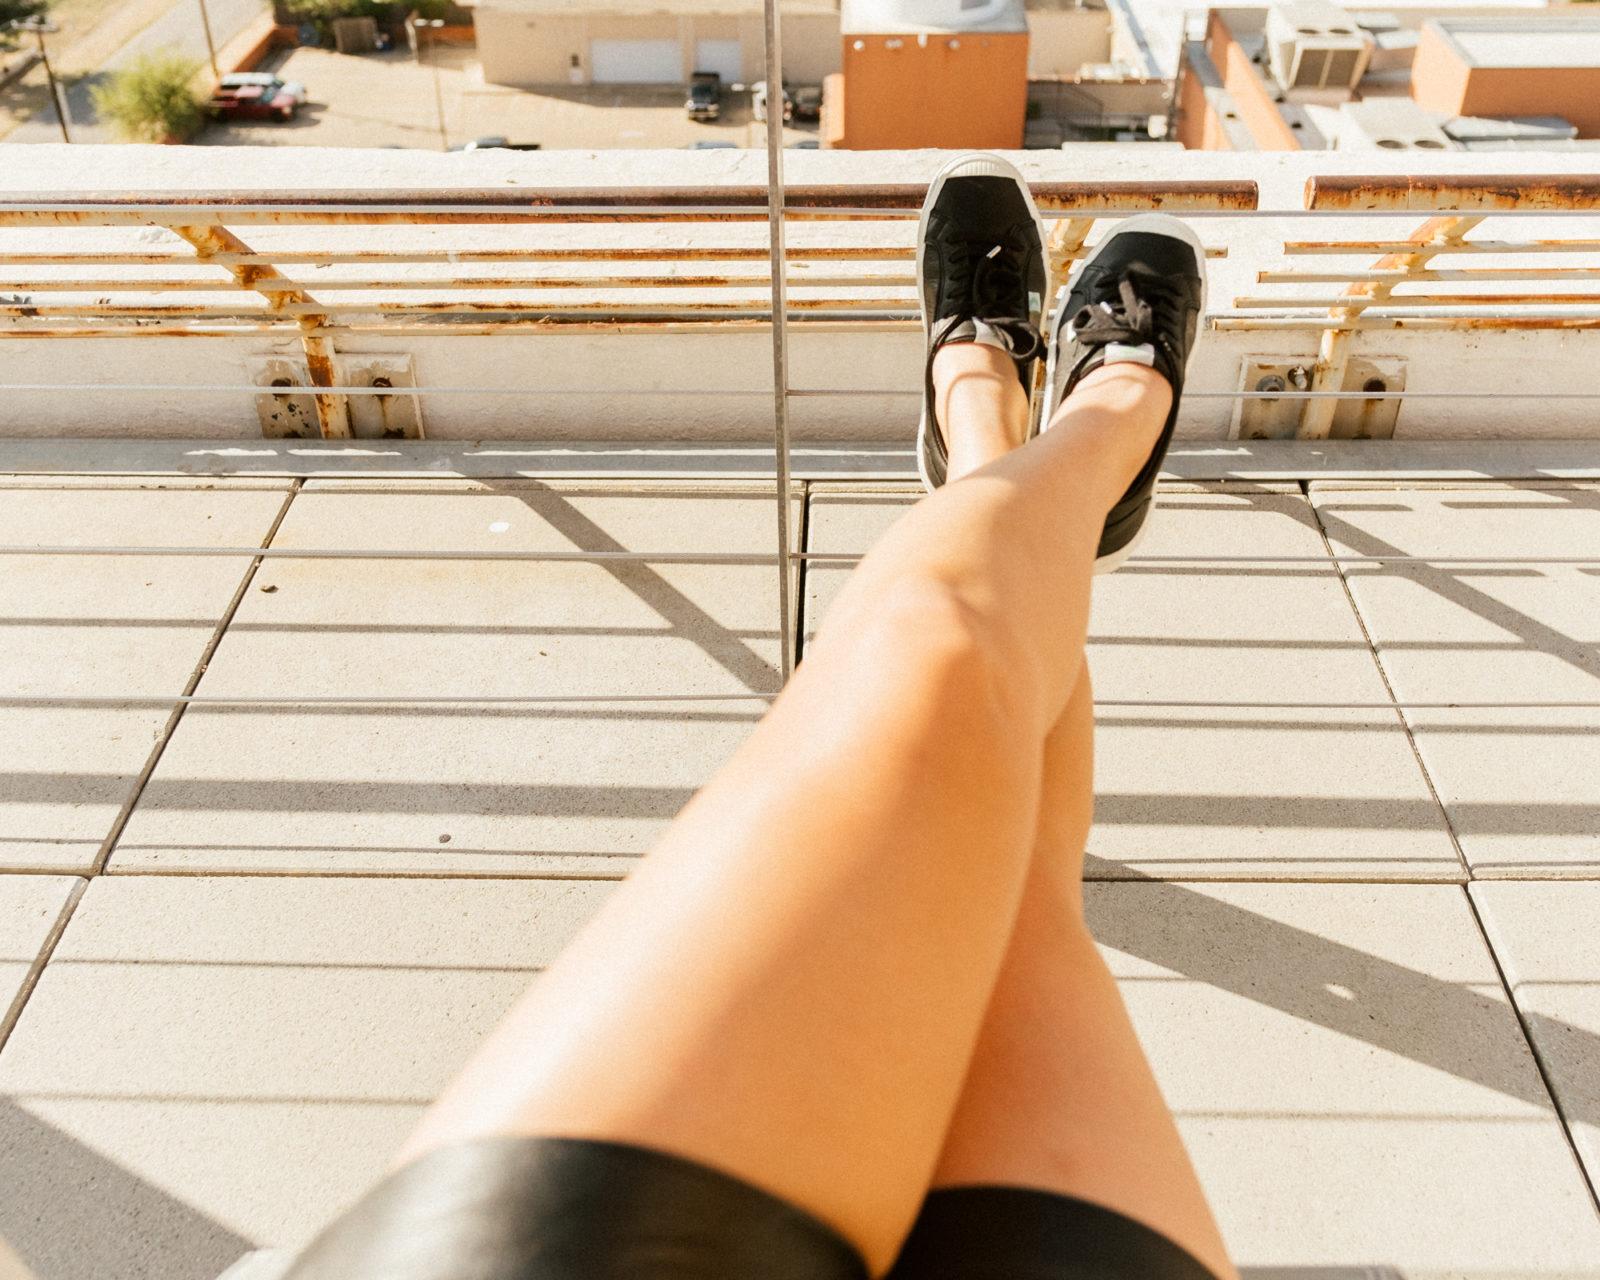 CARIUMA OCA Low Sneakers in Black Leather